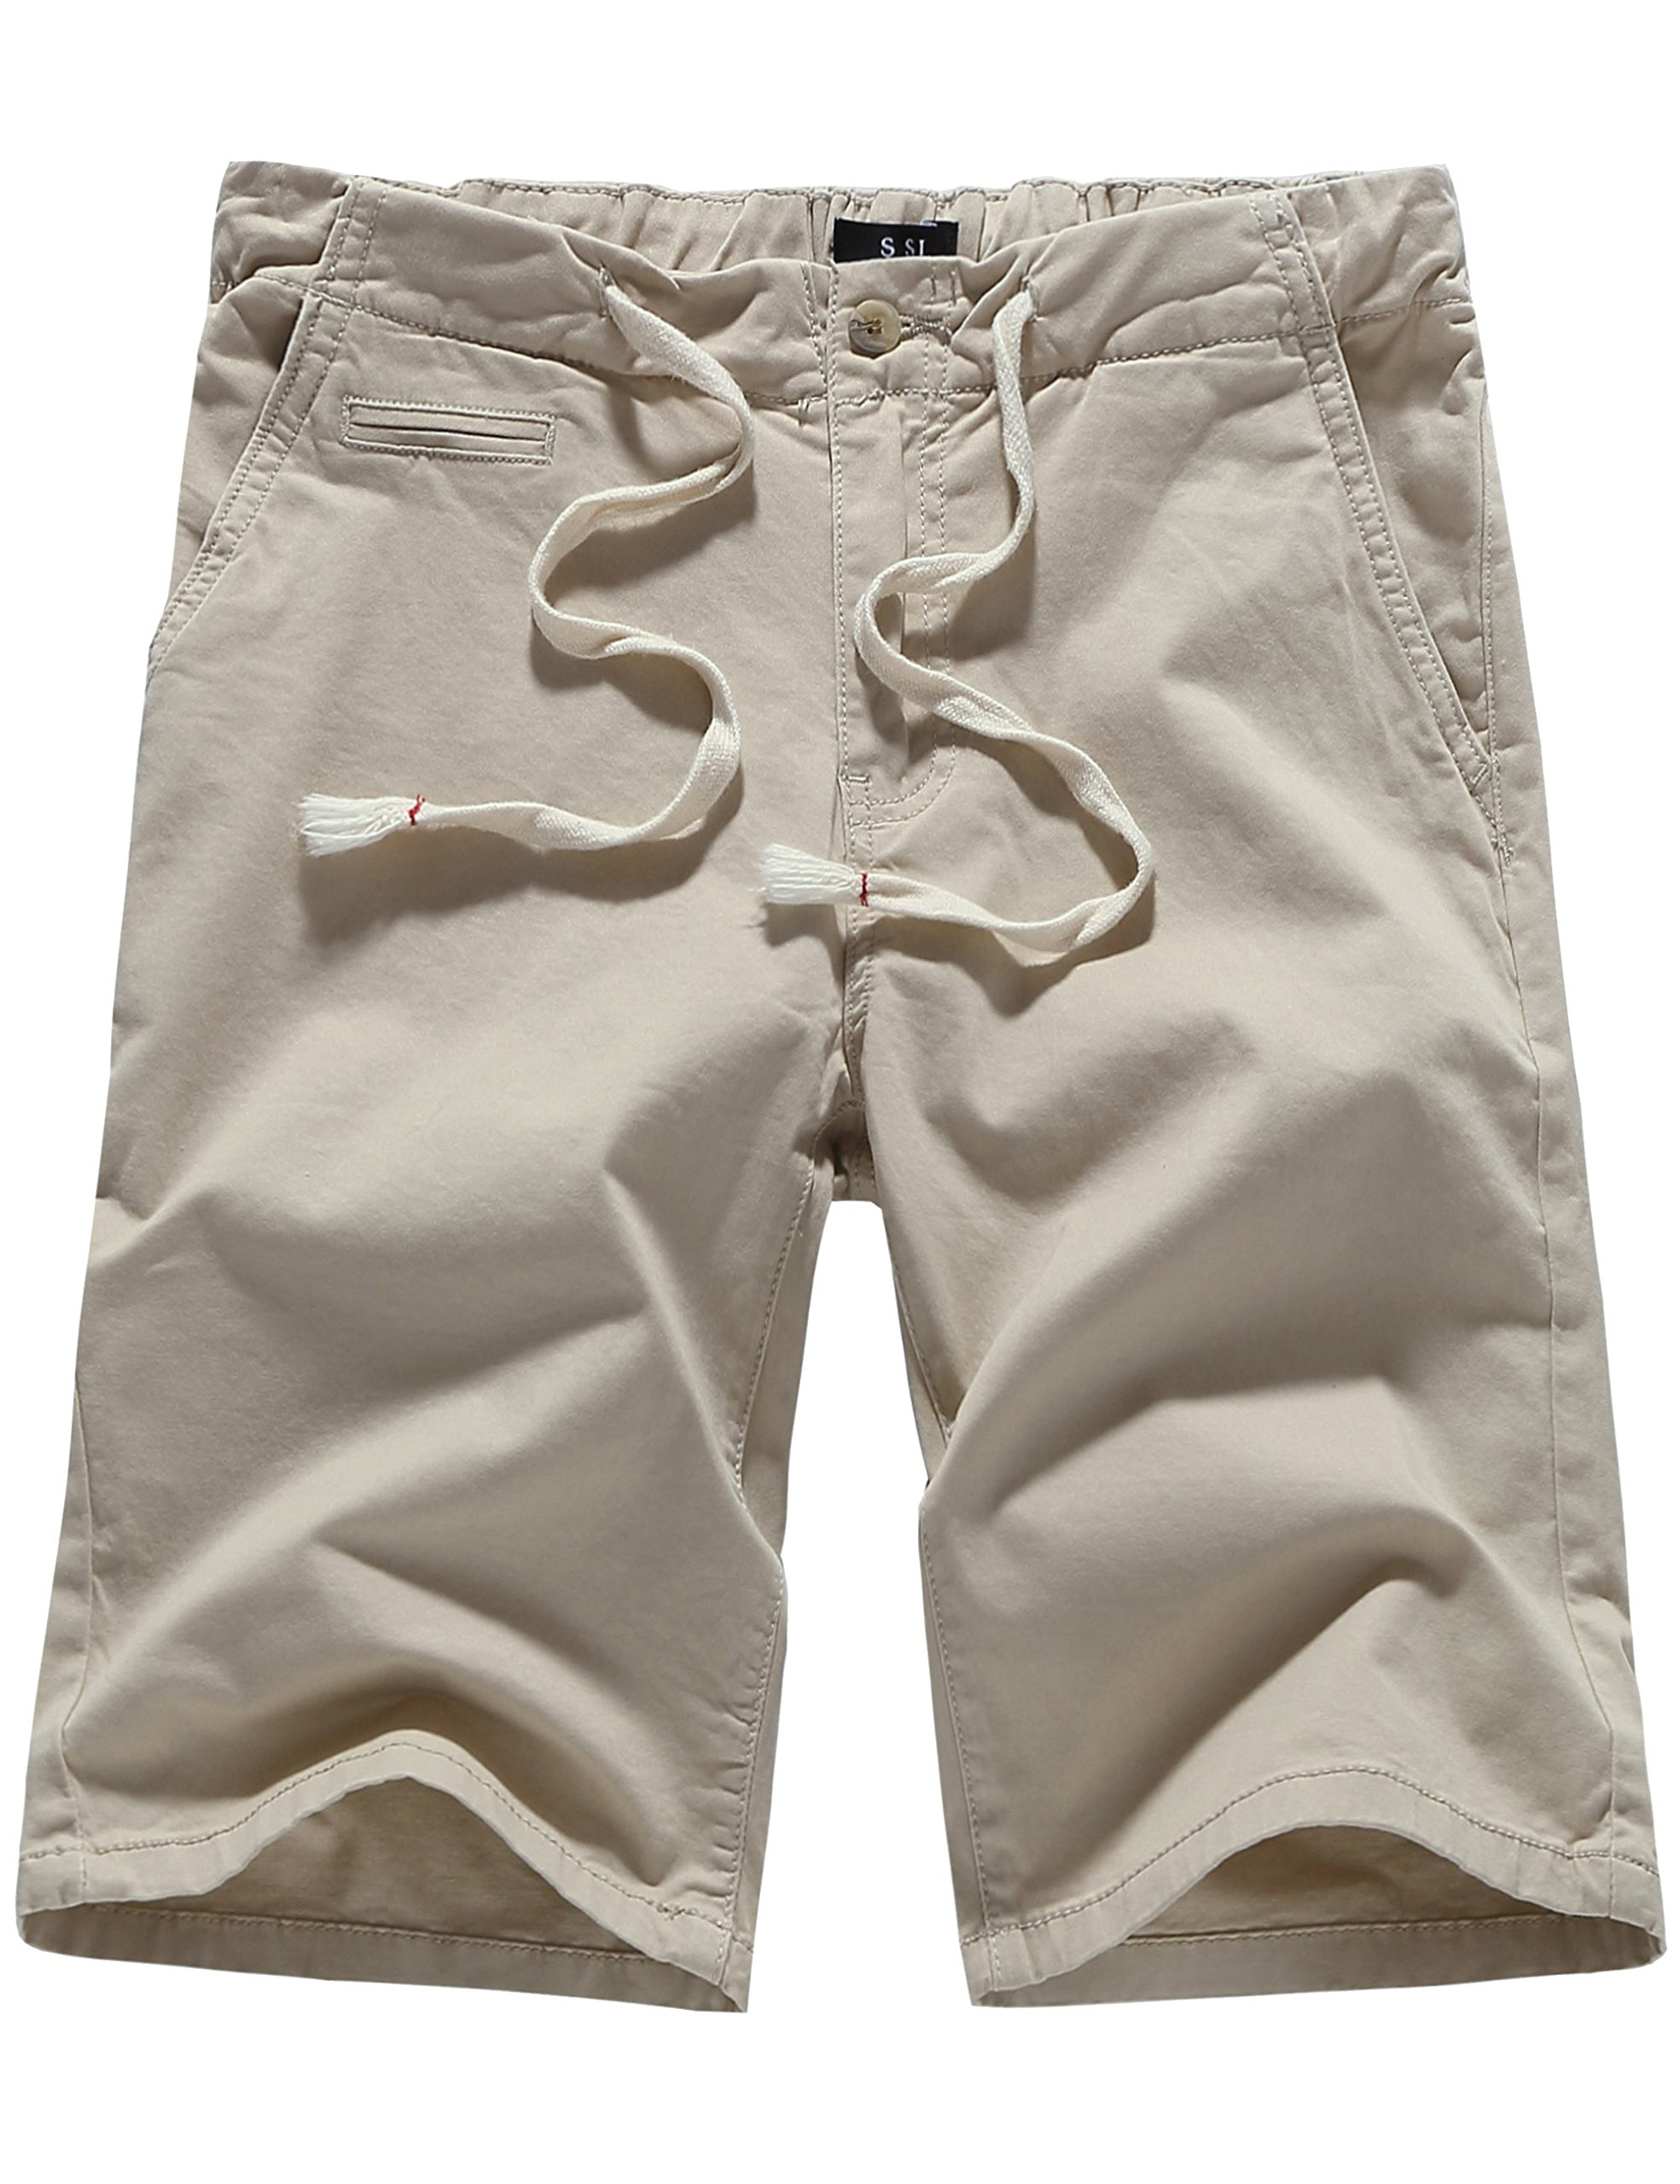 SSLR Men's Cotton Classic Fit Flat Front Casual Drawstring Shorts (36, Beige)